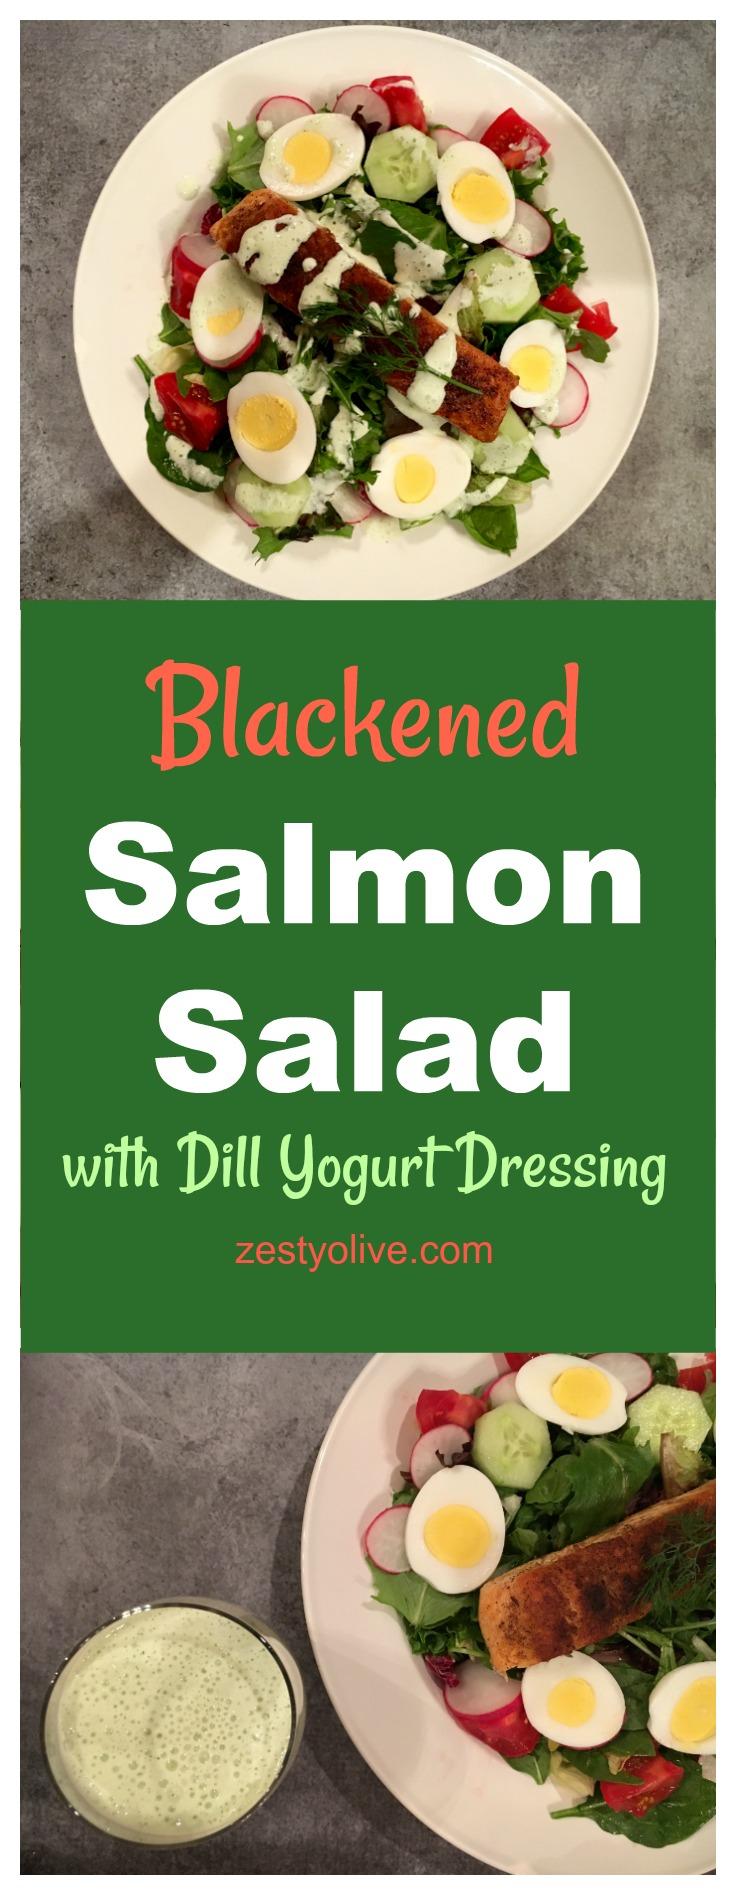 Blackened Salmon Salad with Dill Yogurt Dressing